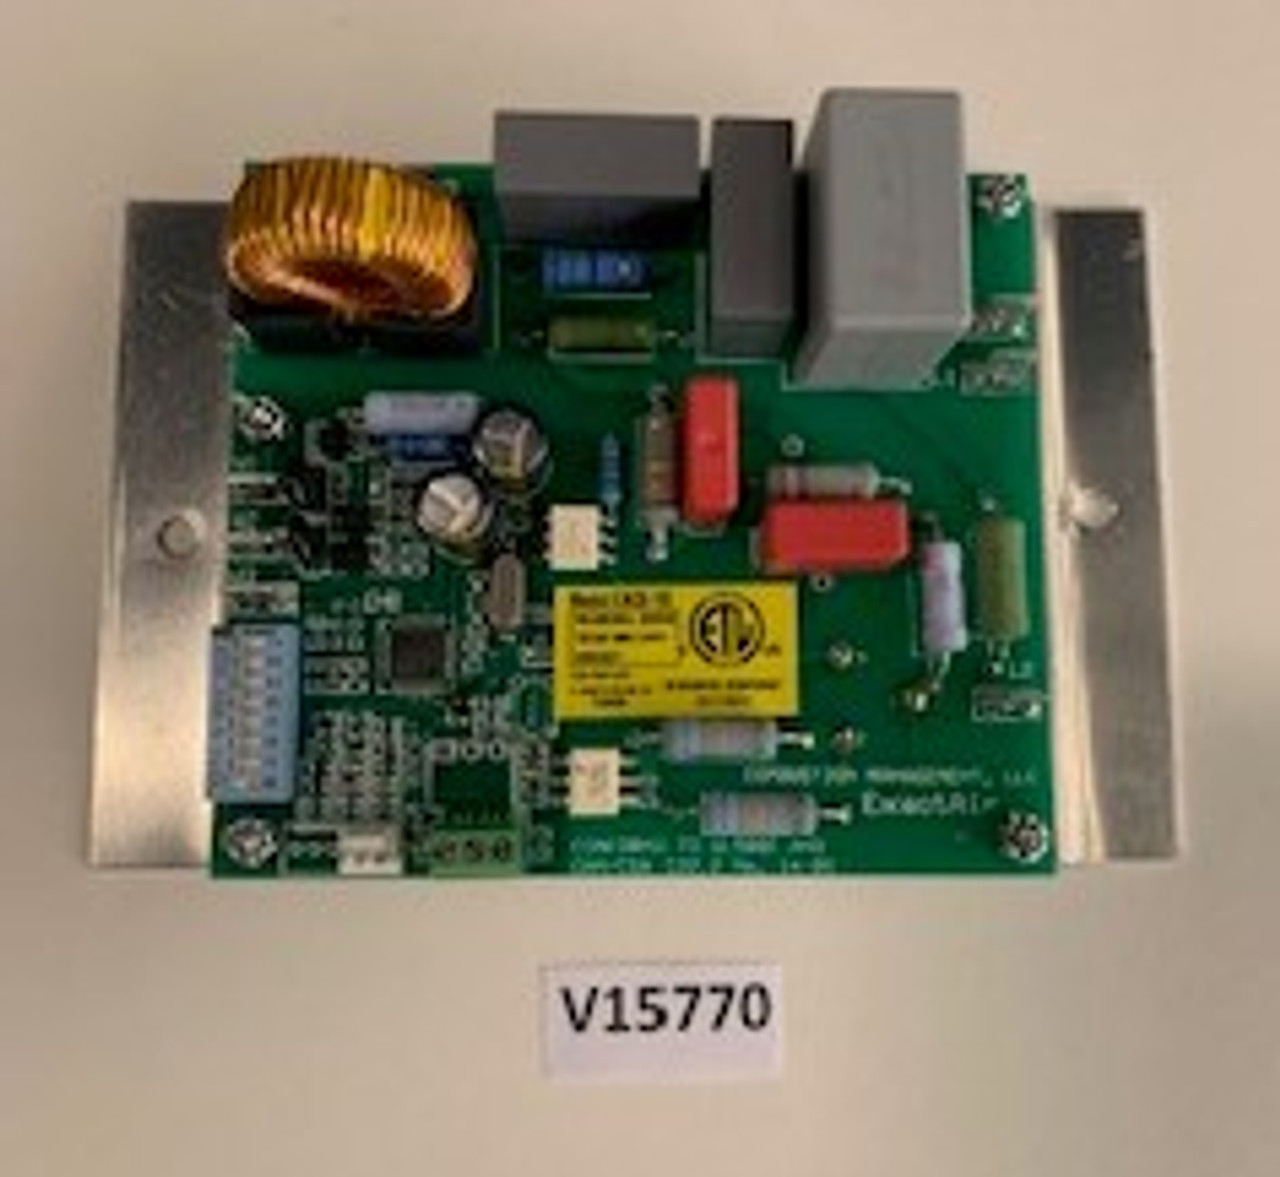 Controller, Speed EAC6-10 480V, Aaon, V15770